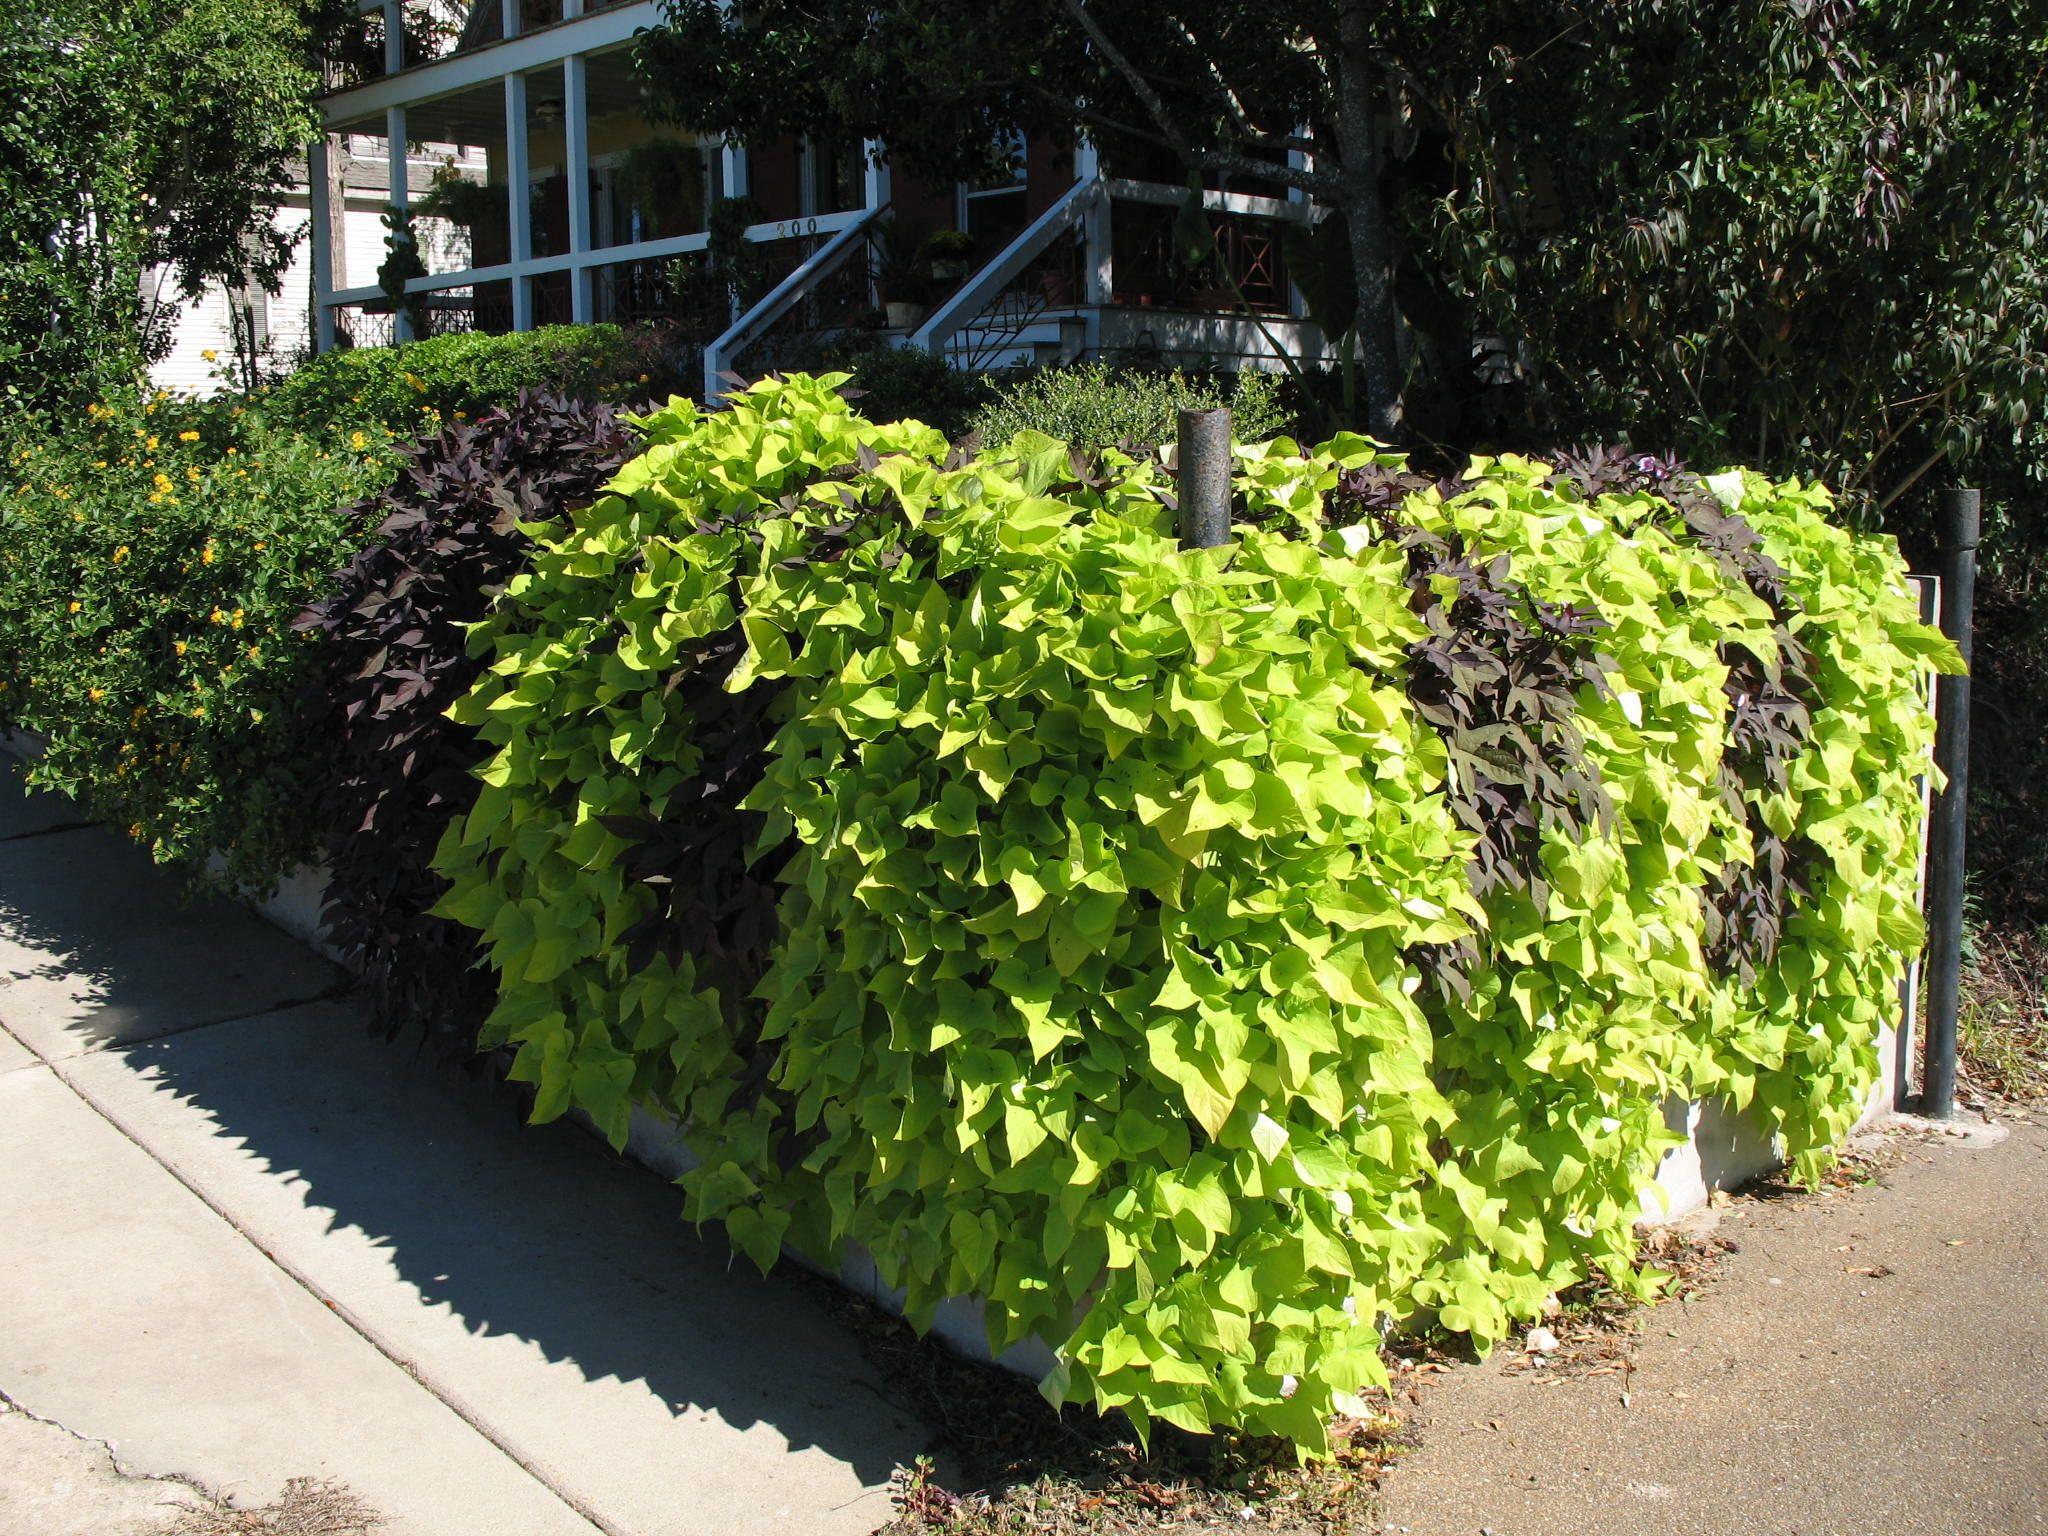 My New Obsession Sweet Potato Vines For All My Flower Pots This Summer Sweet Potato Plant Vine Plants Sweet Potato Vine